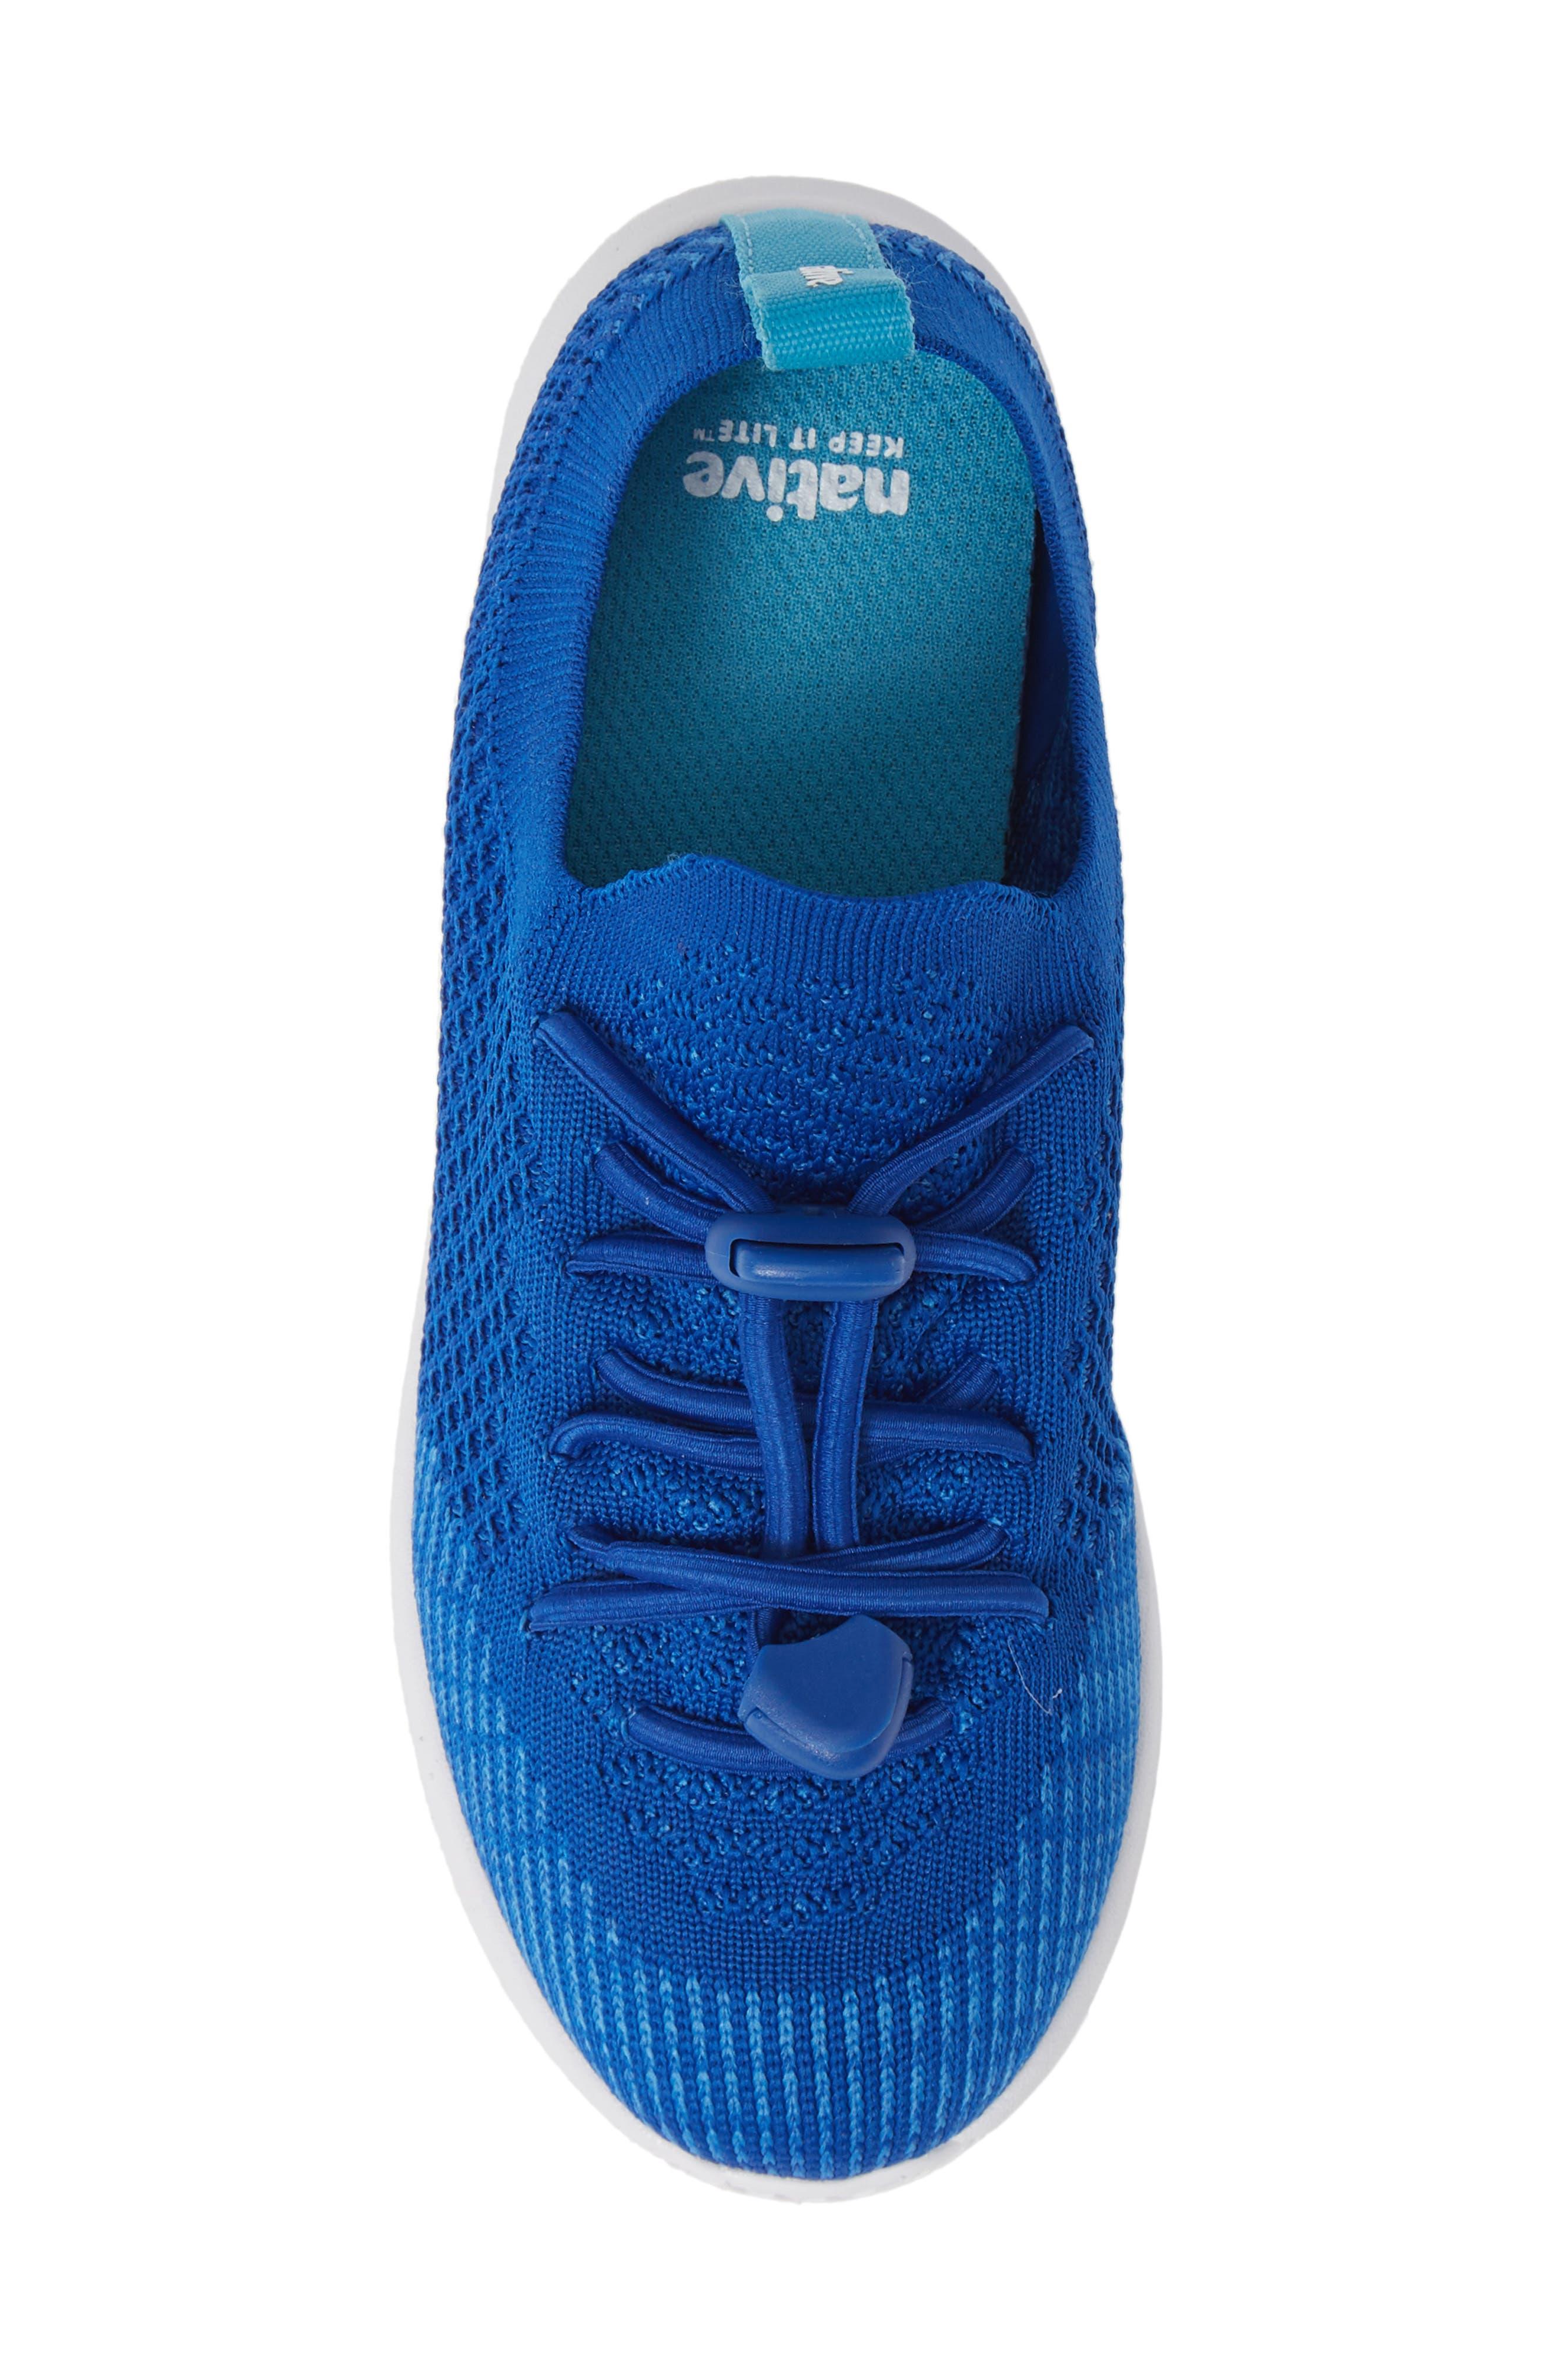 AP Mercury LiteKnit Sneaker,                             Alternate thumbnail 5, color,                             VICTORIA BLUE/ SHELL WHITE